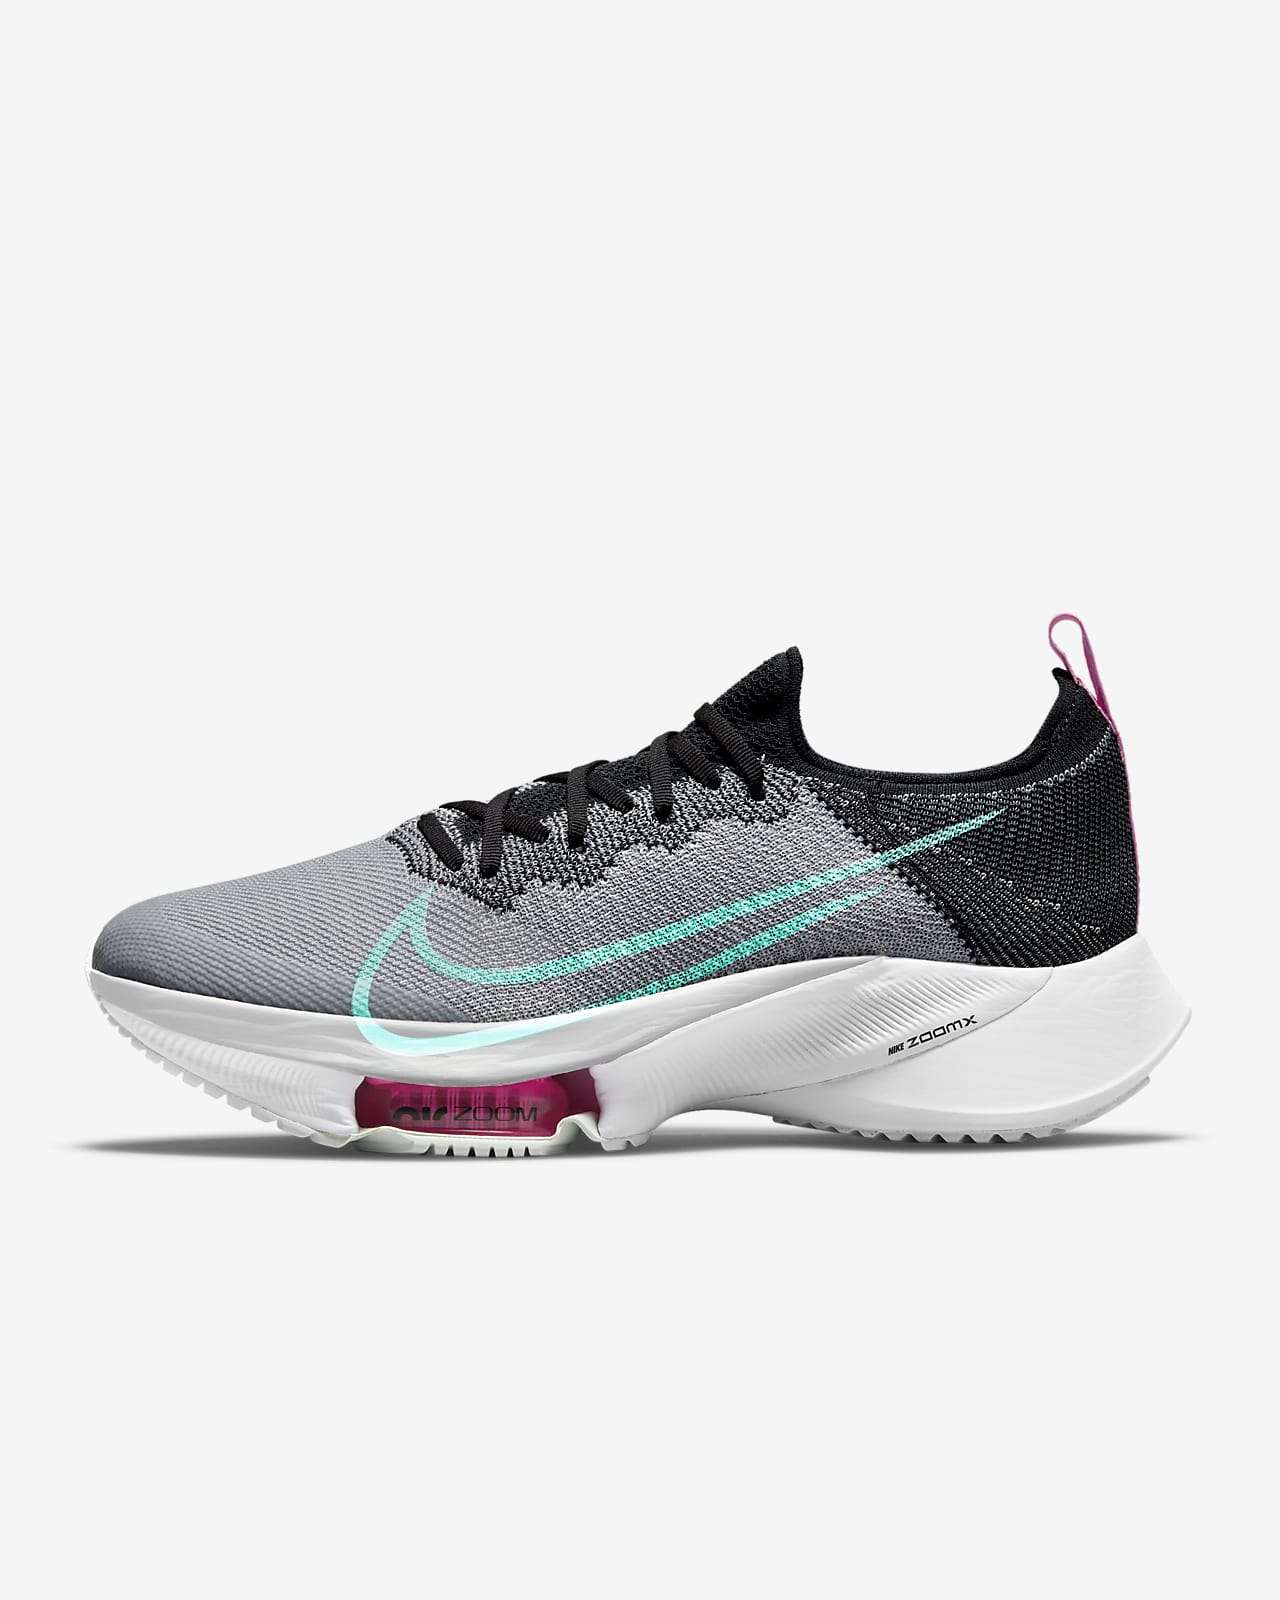 Nike Air Zoom Tempo NEXT% Herren-Straßenlaufschuh